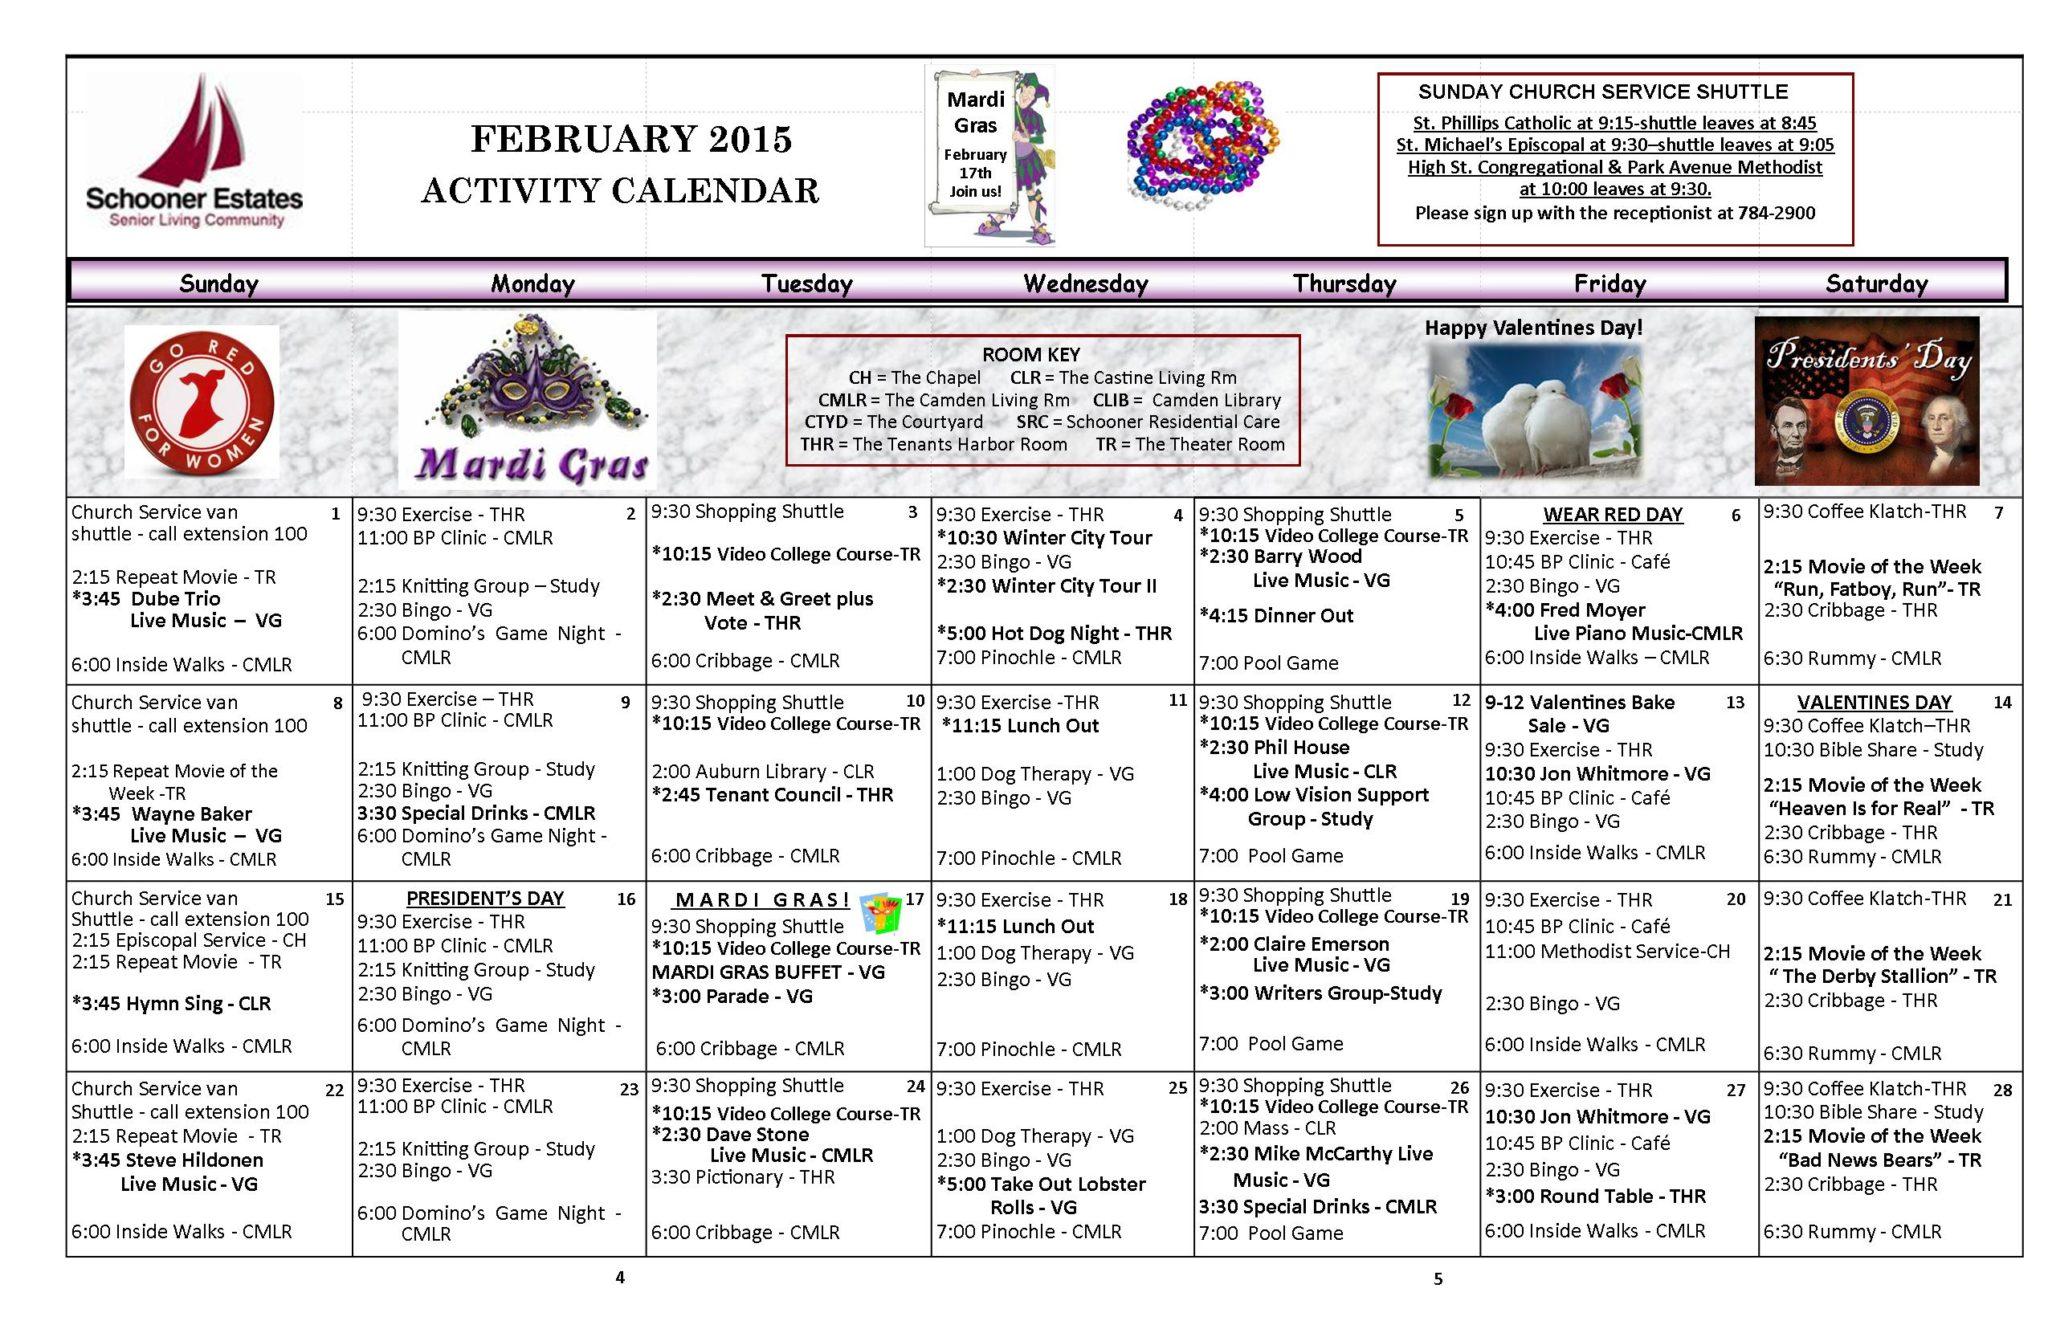 February 2015 activity calendar